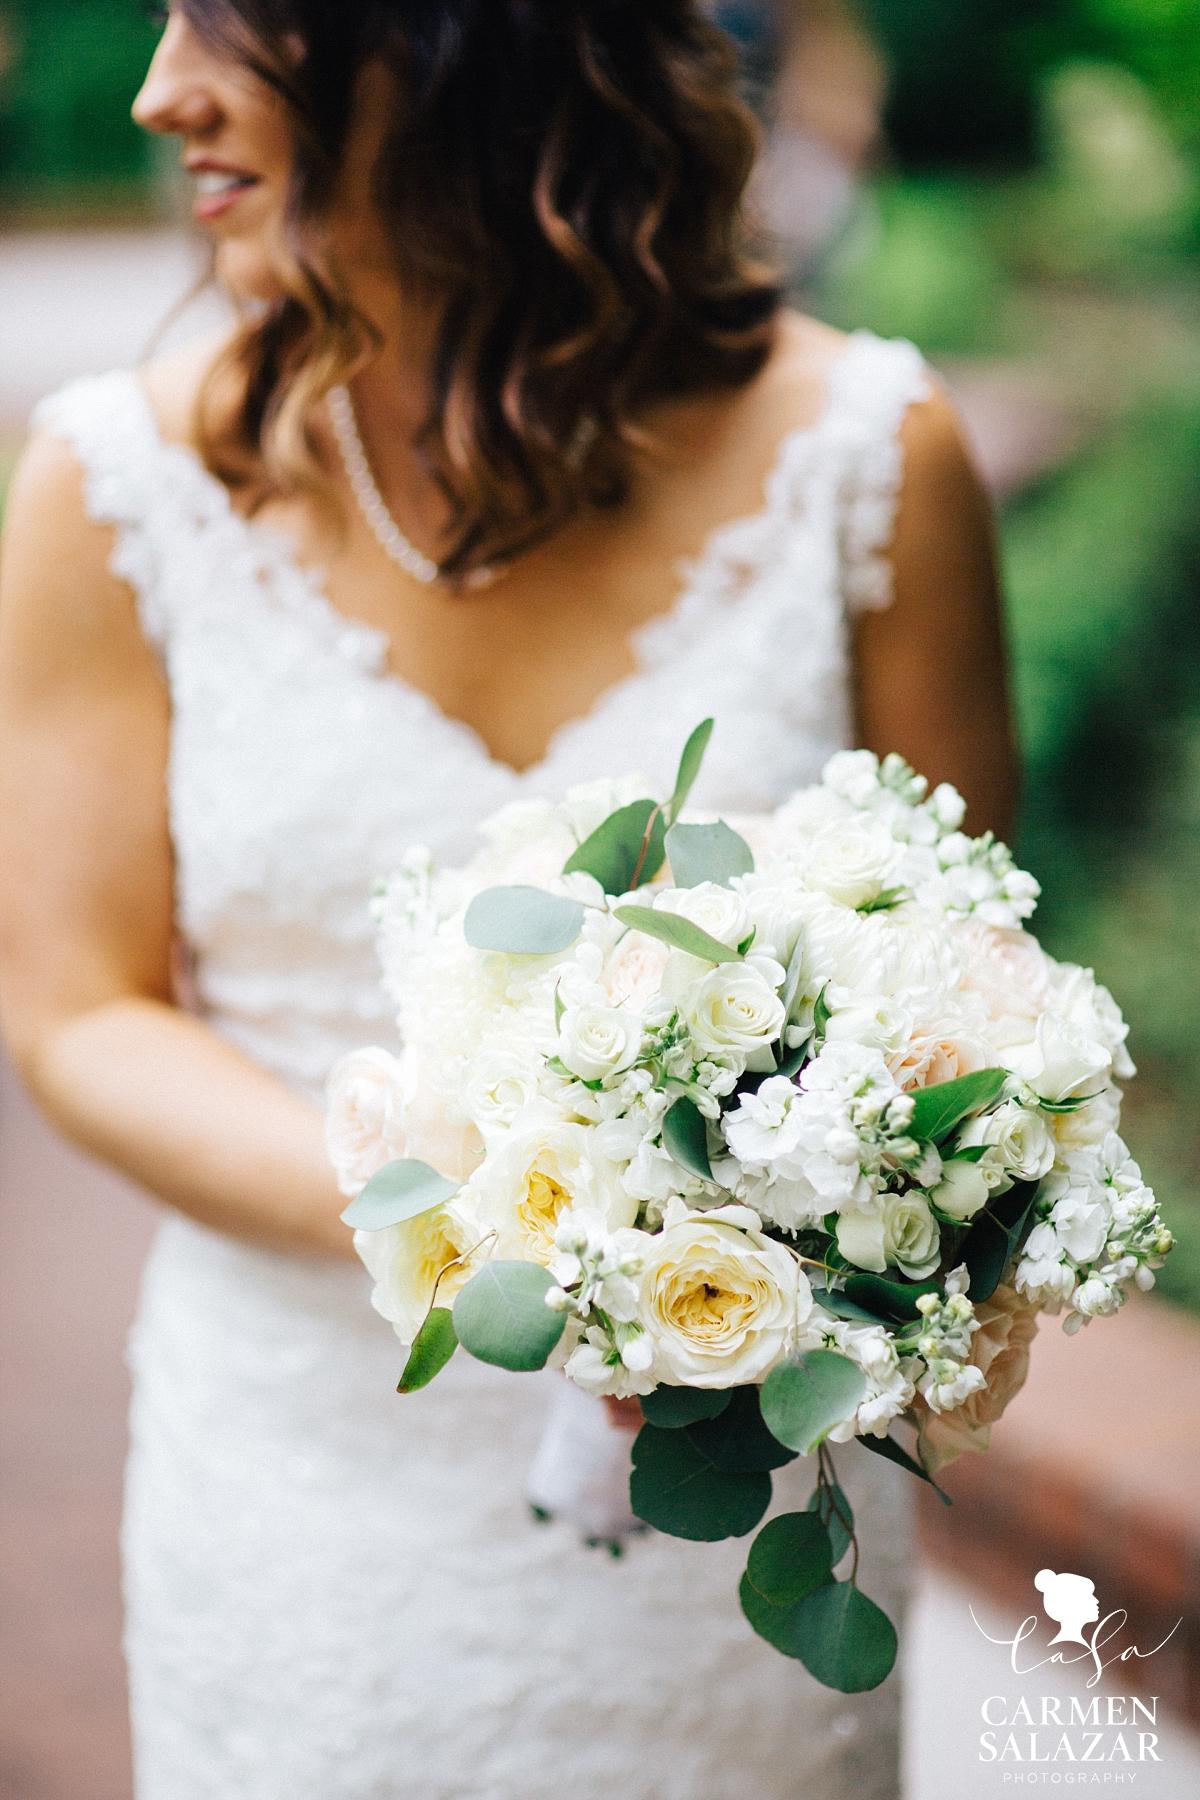 Lovely ivory and mint bridal bouquet - Carmen Salazar